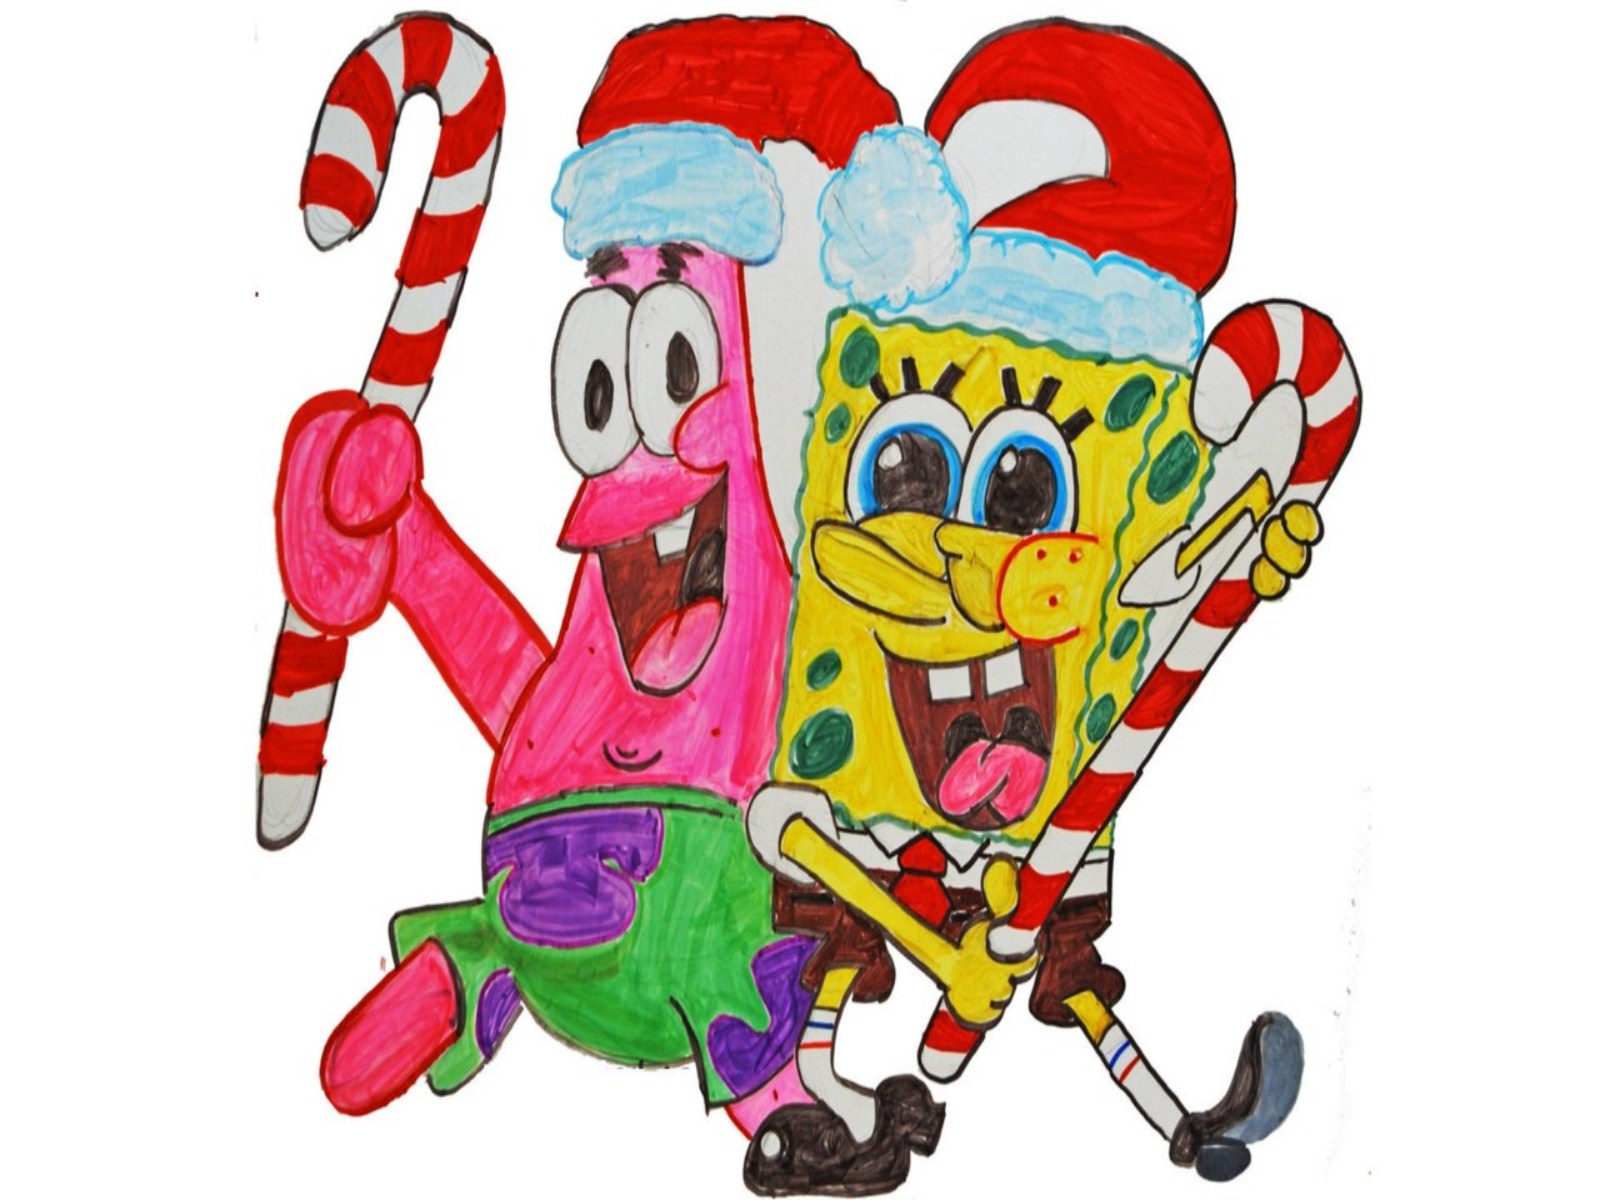 1600x1200 Spongebob Christmas Wallpapers Group